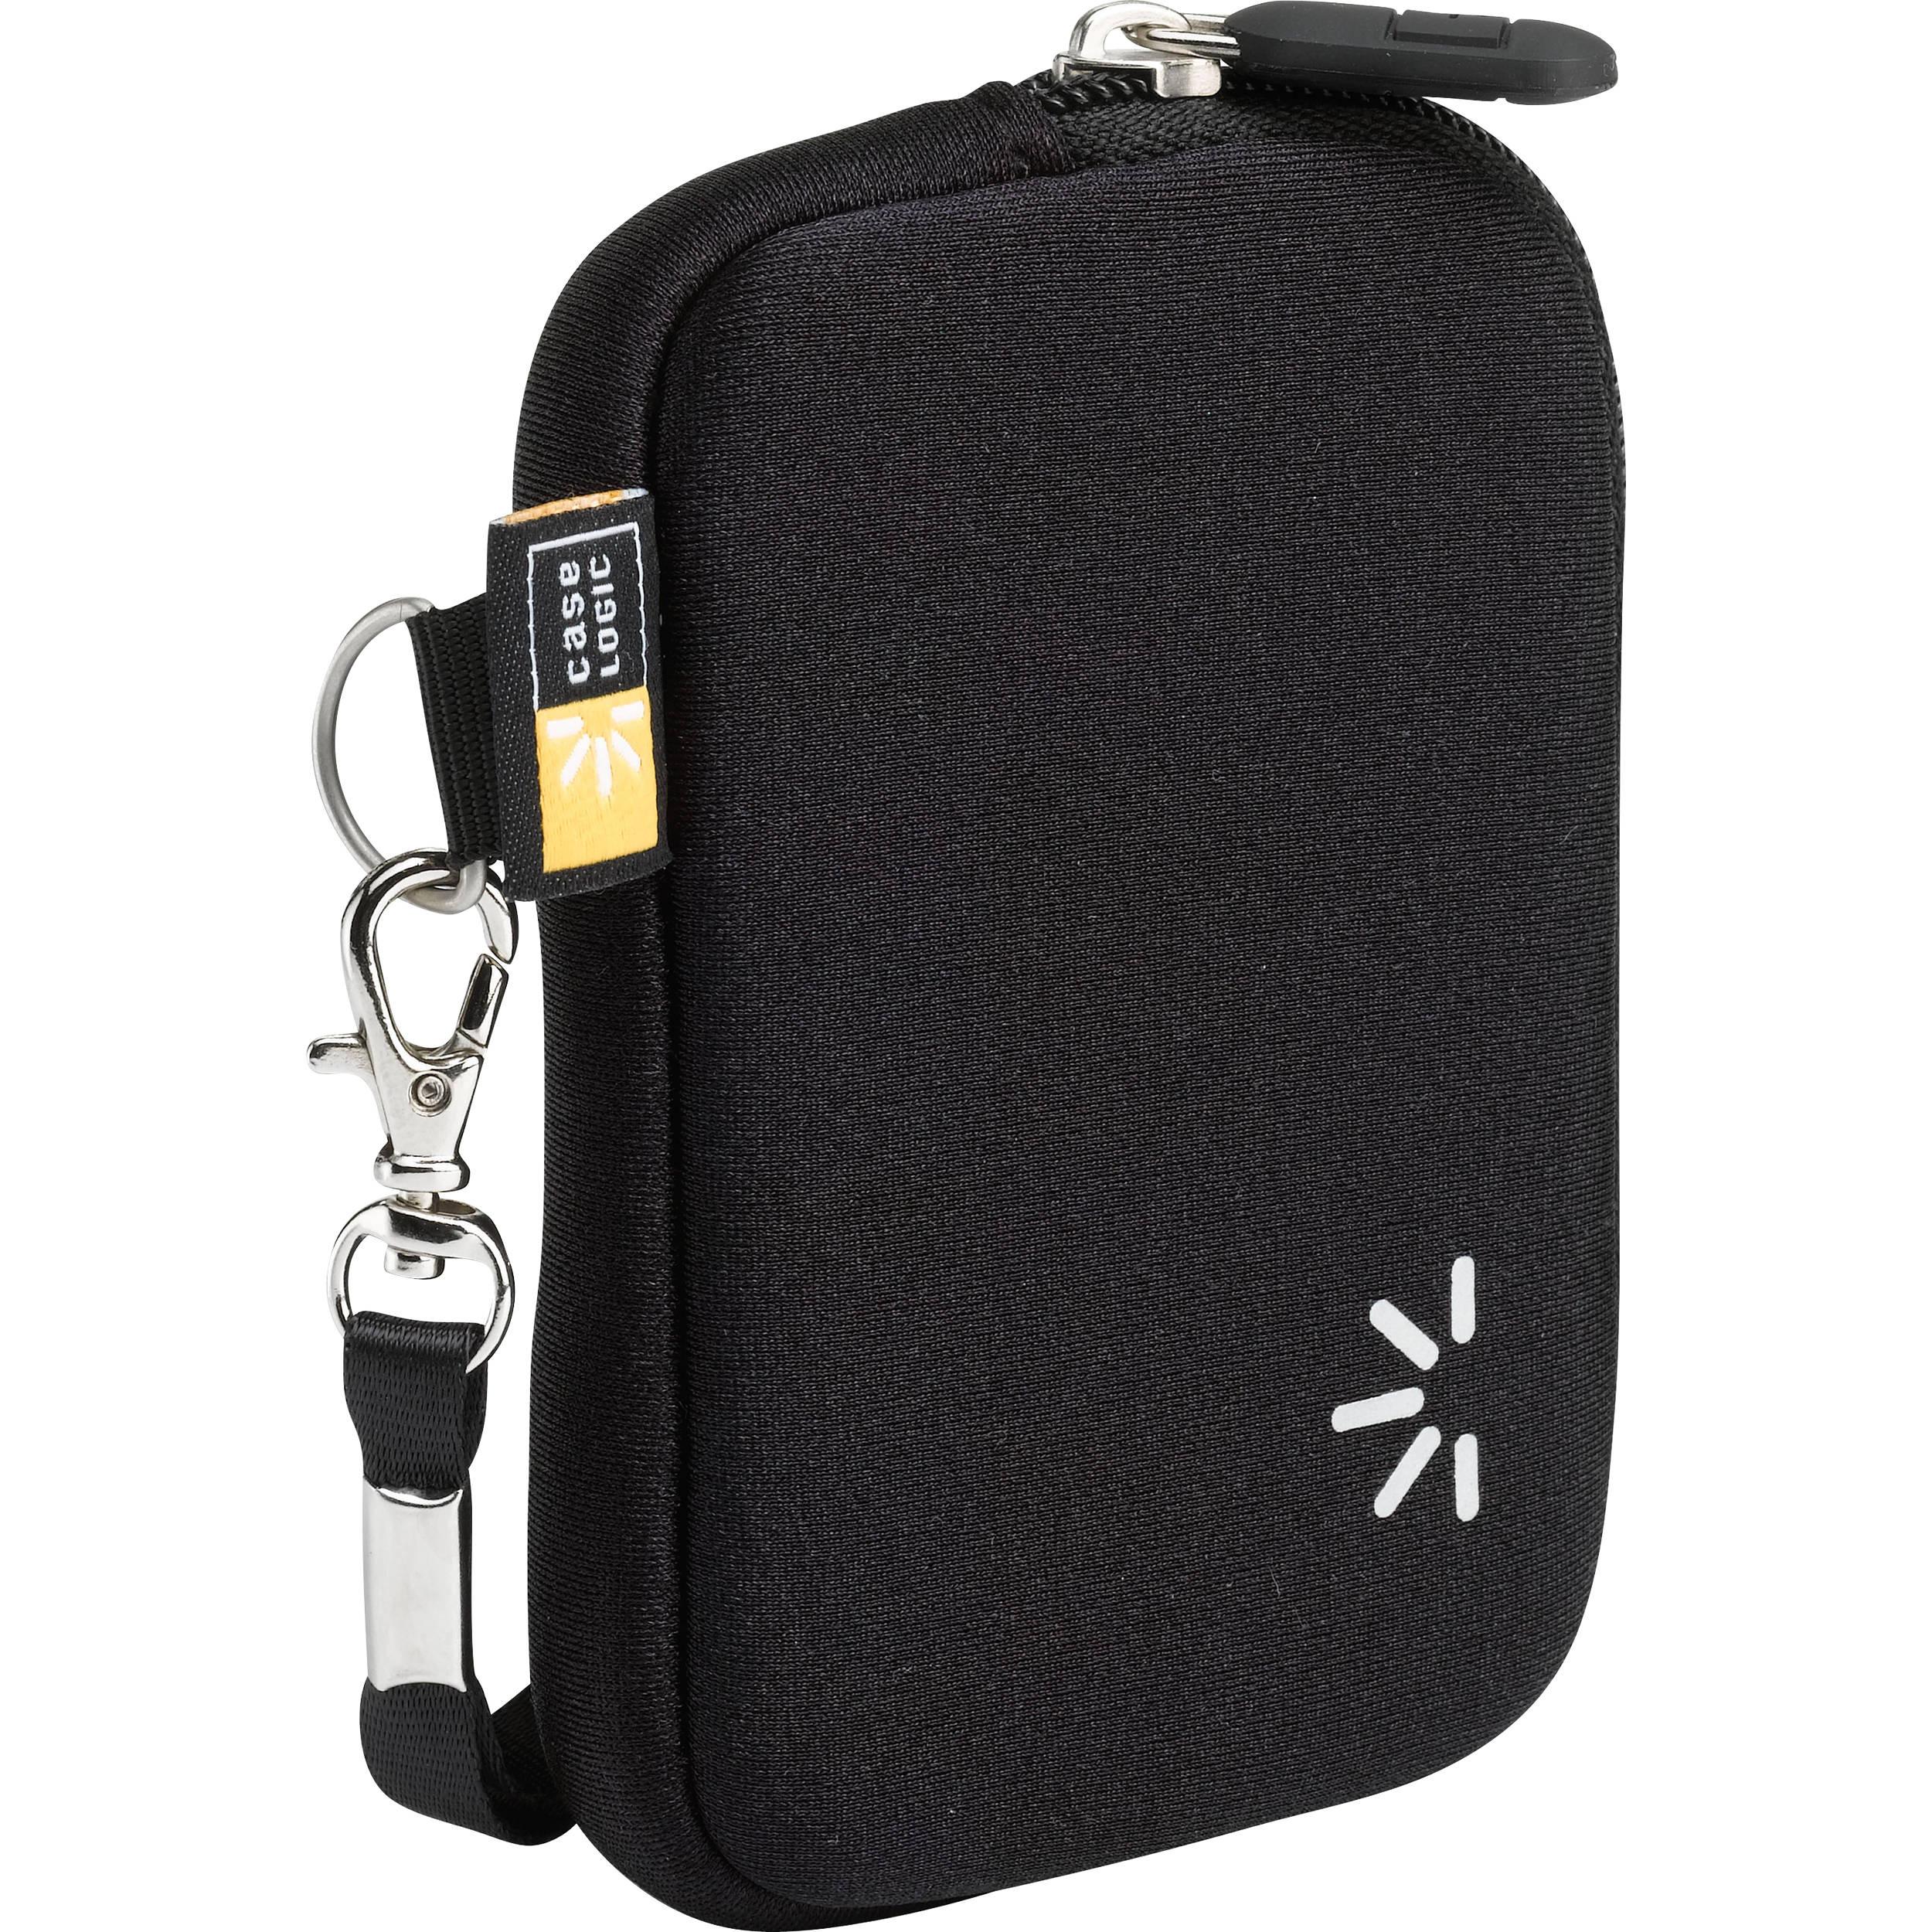 Case Logic UNZB-2 Universal Pocket (Black)